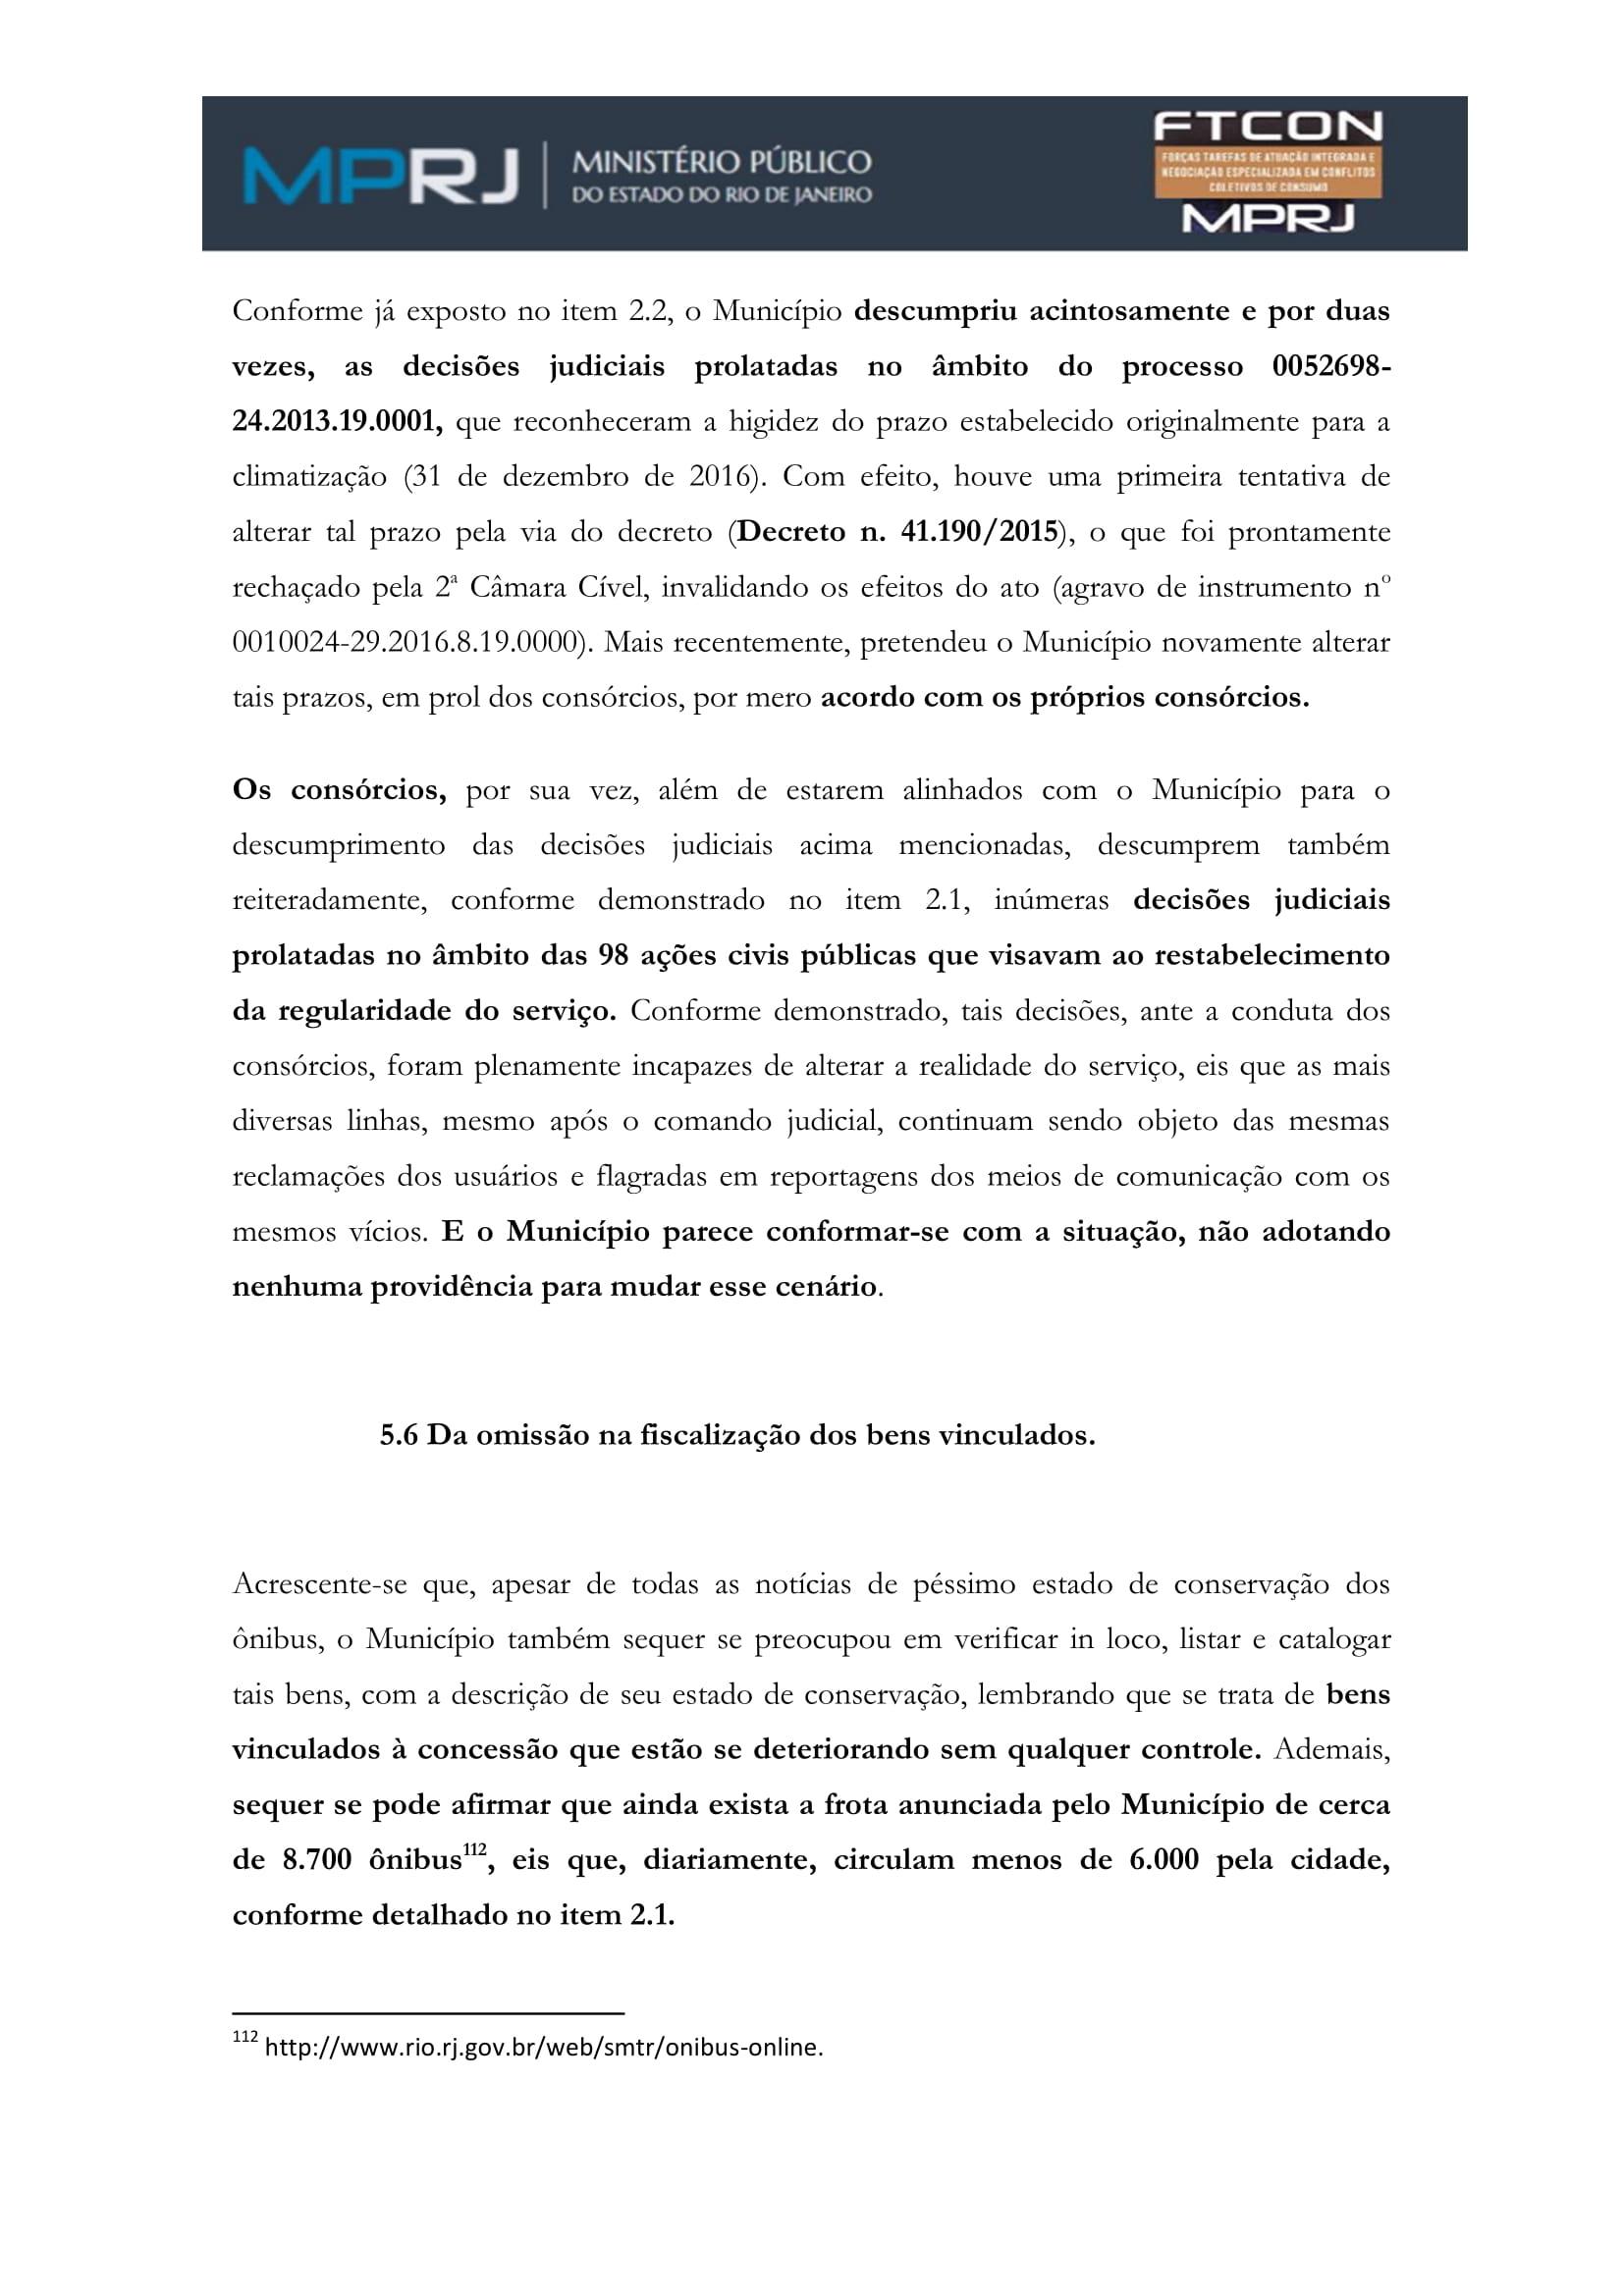 acp_caducidade_onibus_dr_rt-119